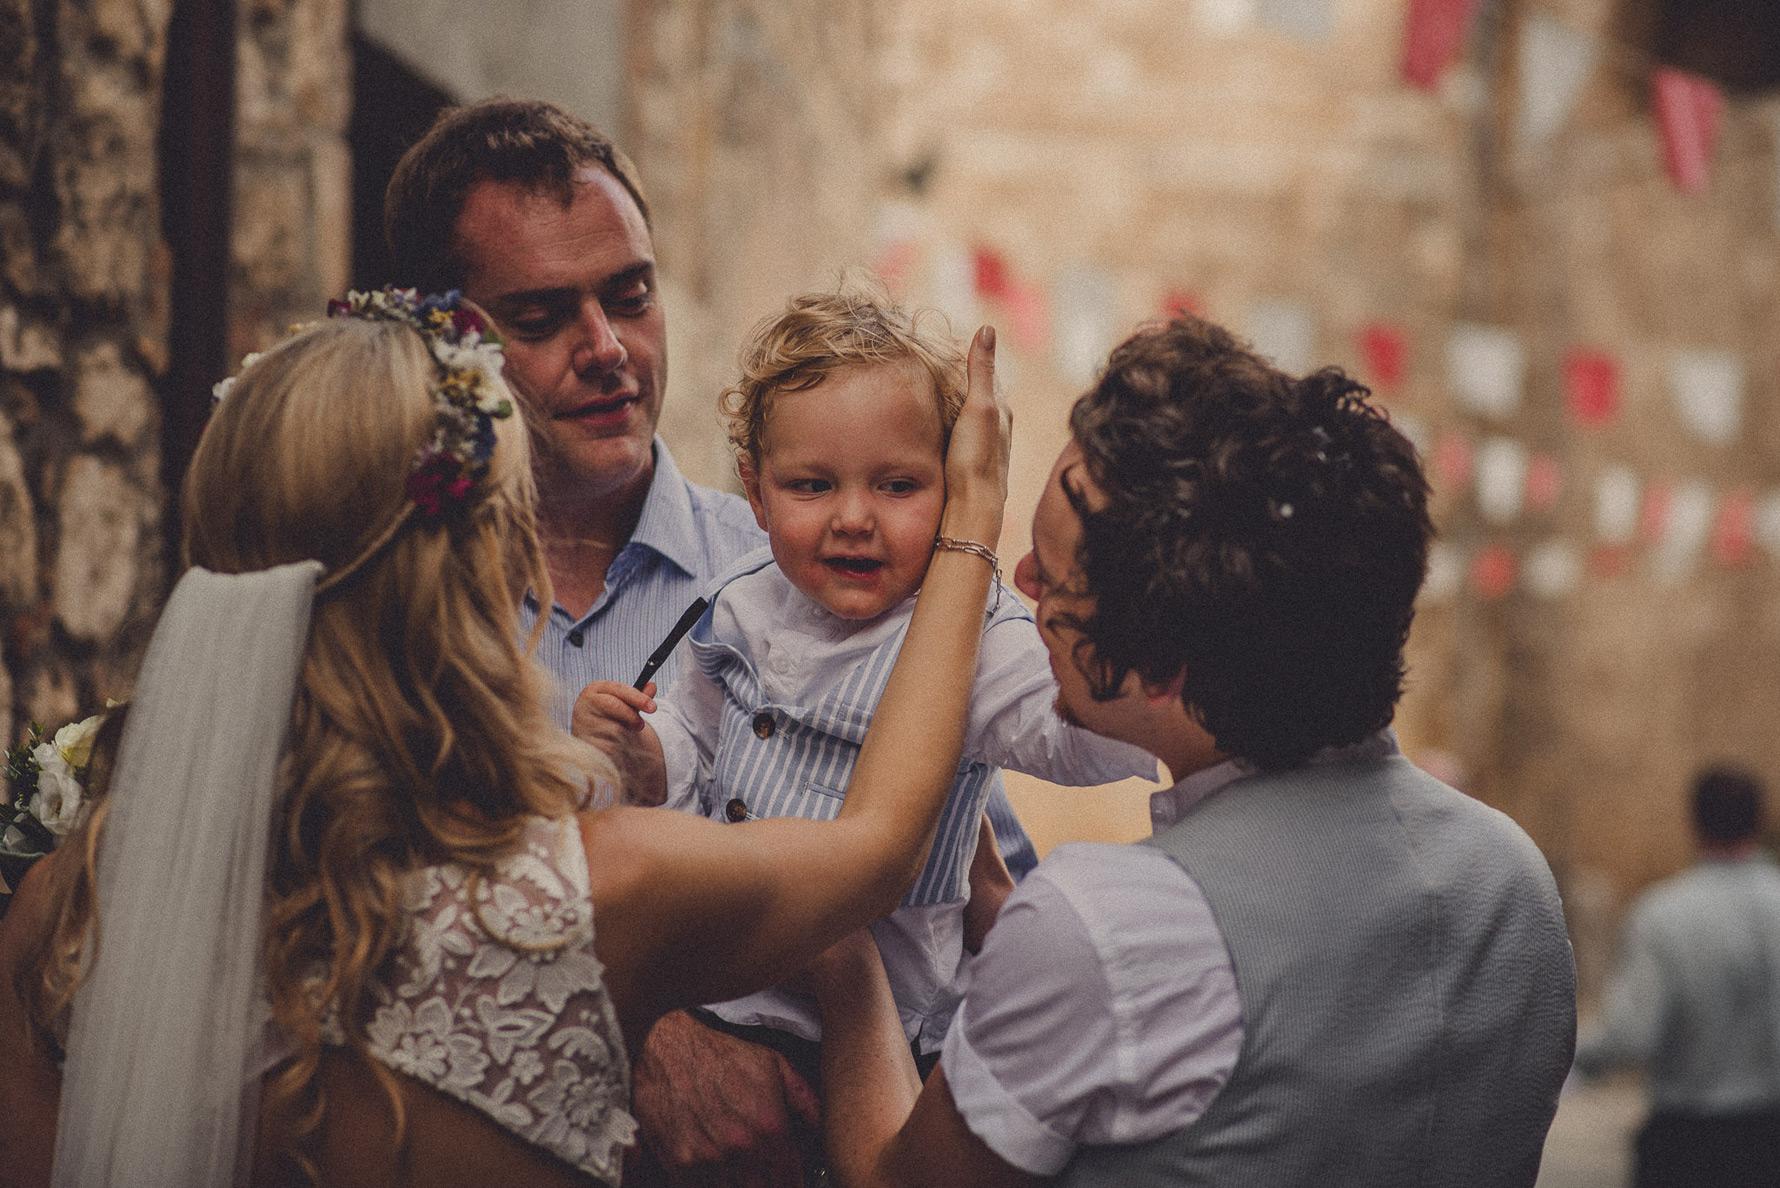 wedding-in-palazzo-cennini-sarteano-livio-lacurre-photography